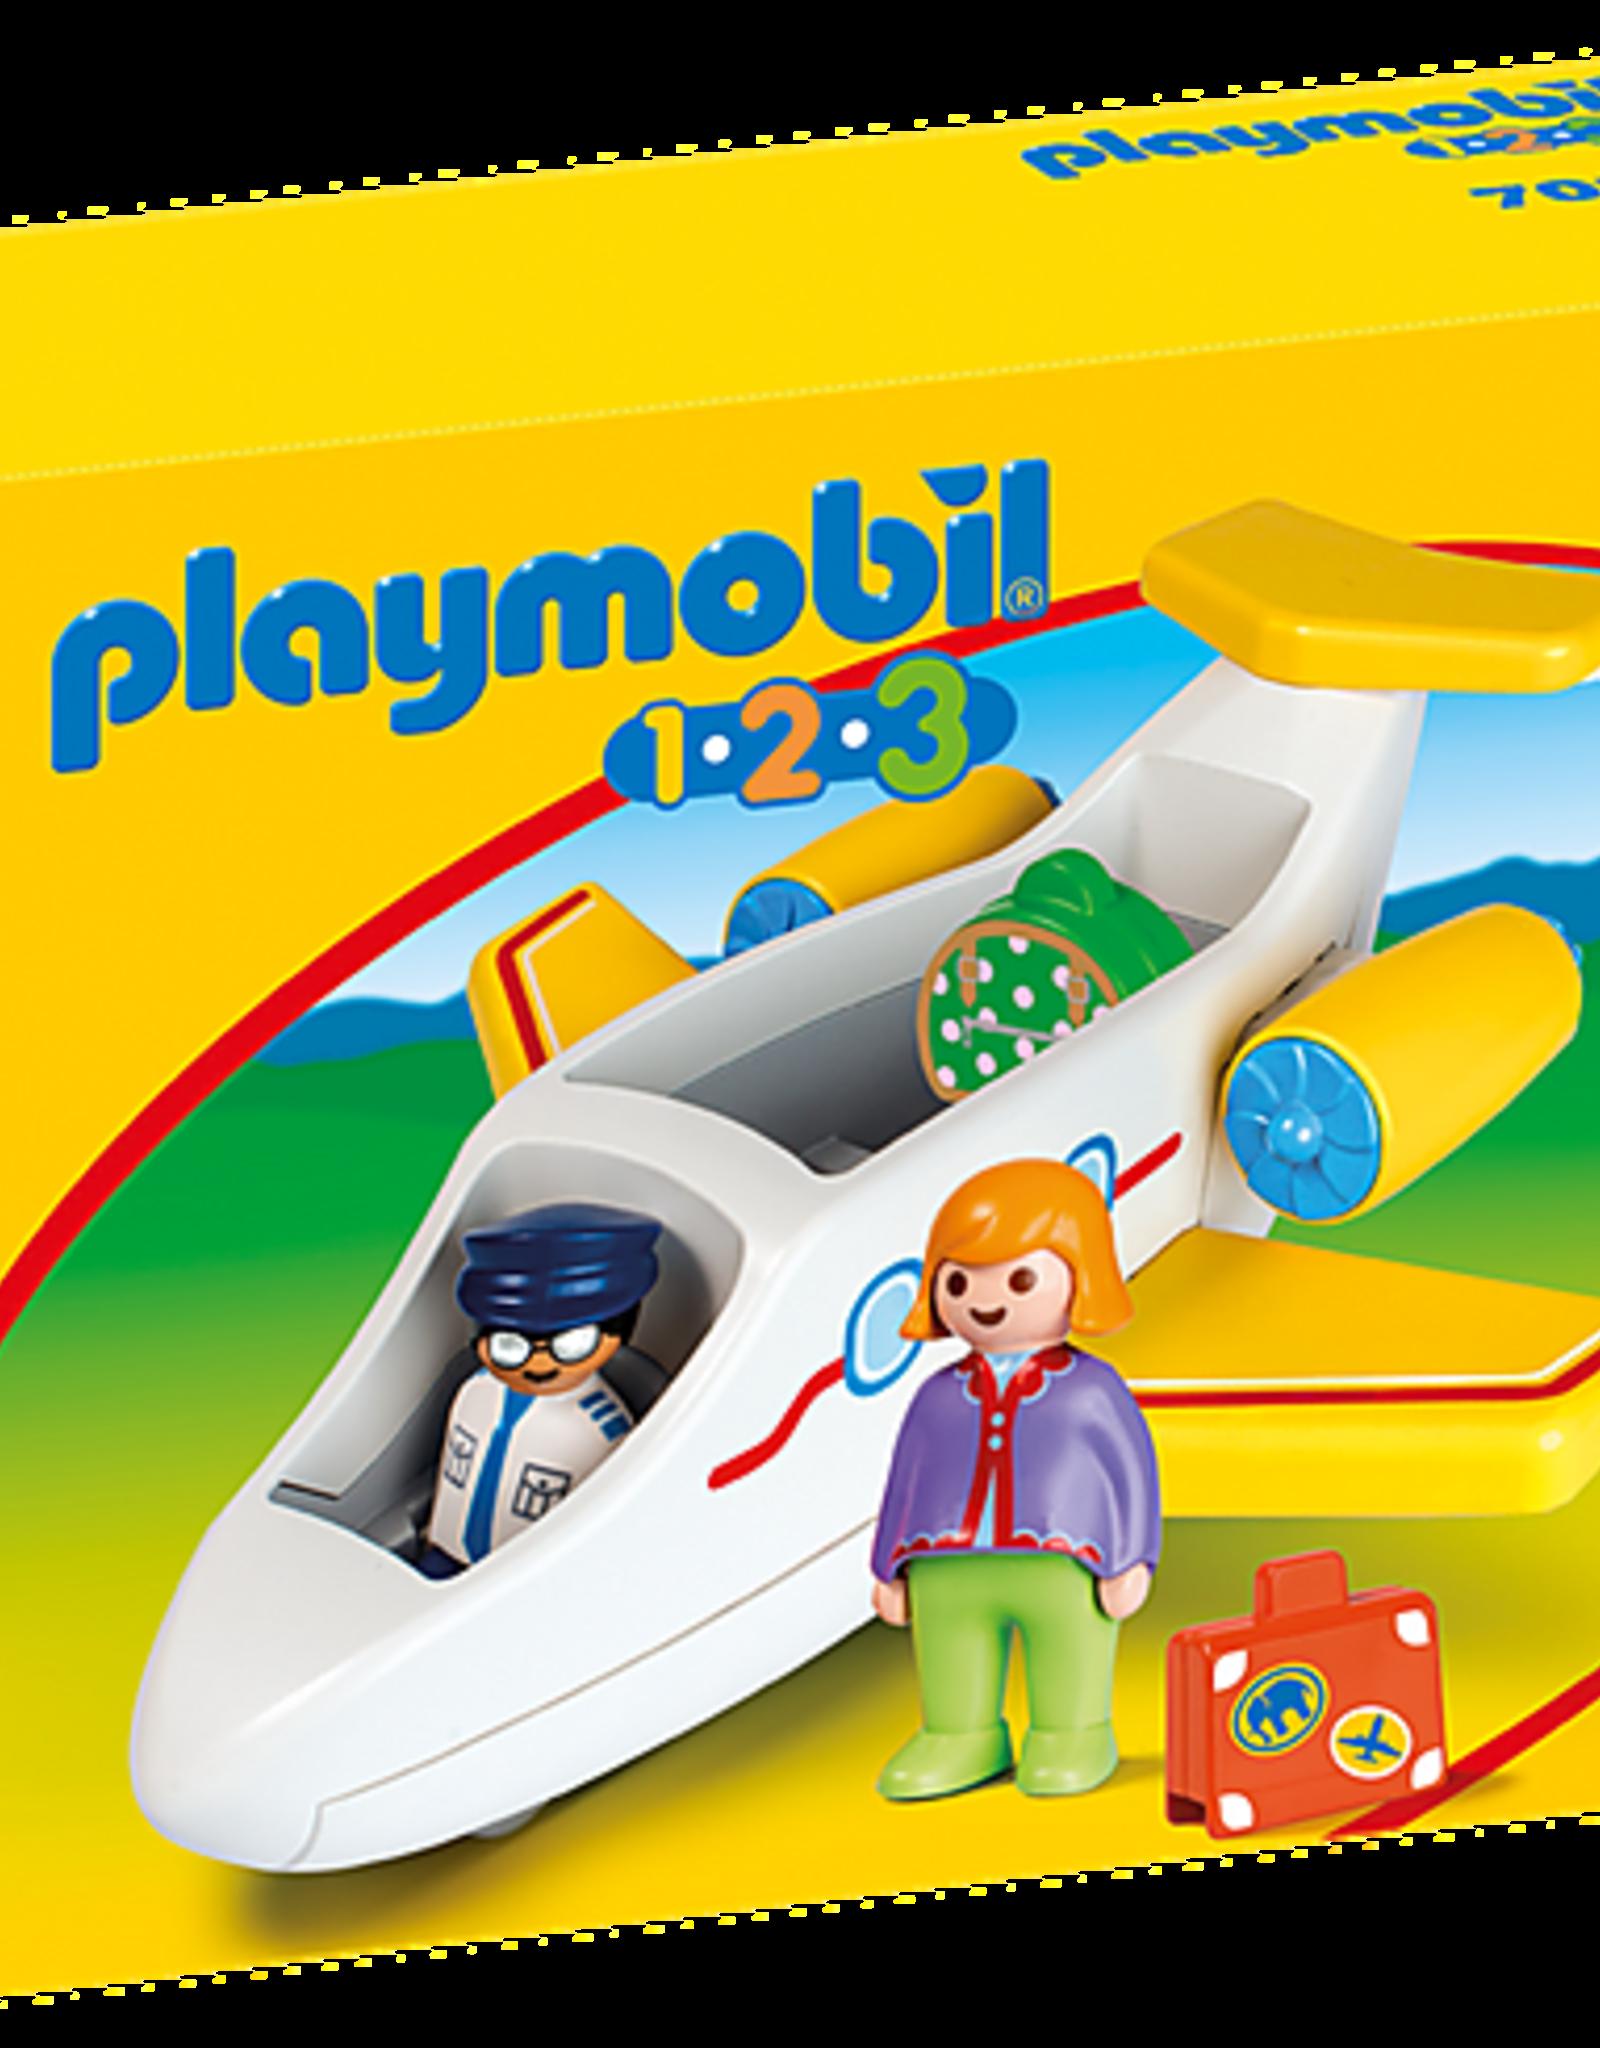 Playmobil 1,2,3 - Plane with Passenger